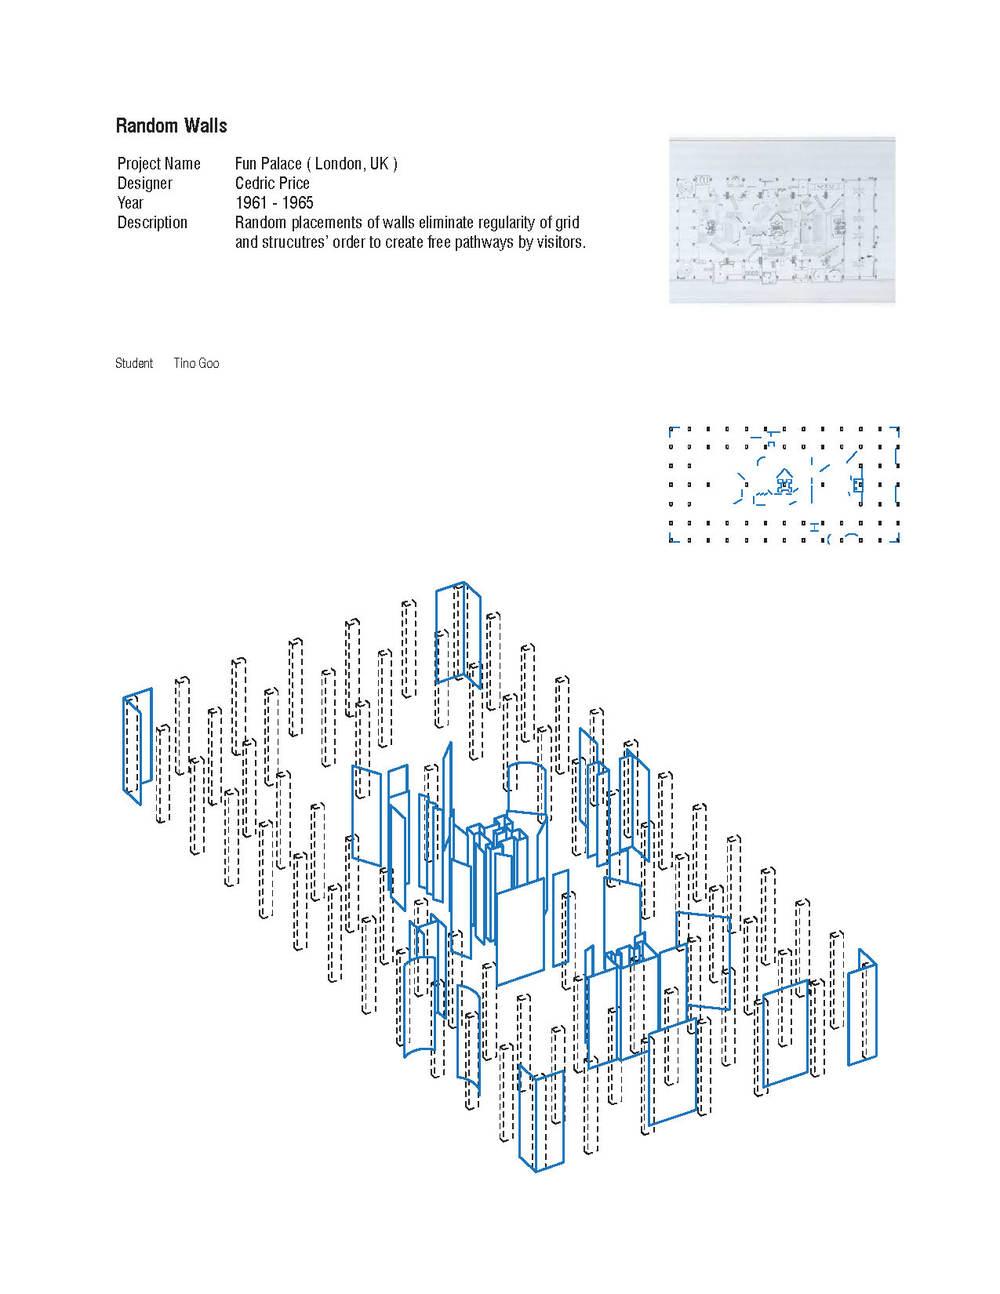 Goo_hyeongmo_Fun palace_Page_2.jpg